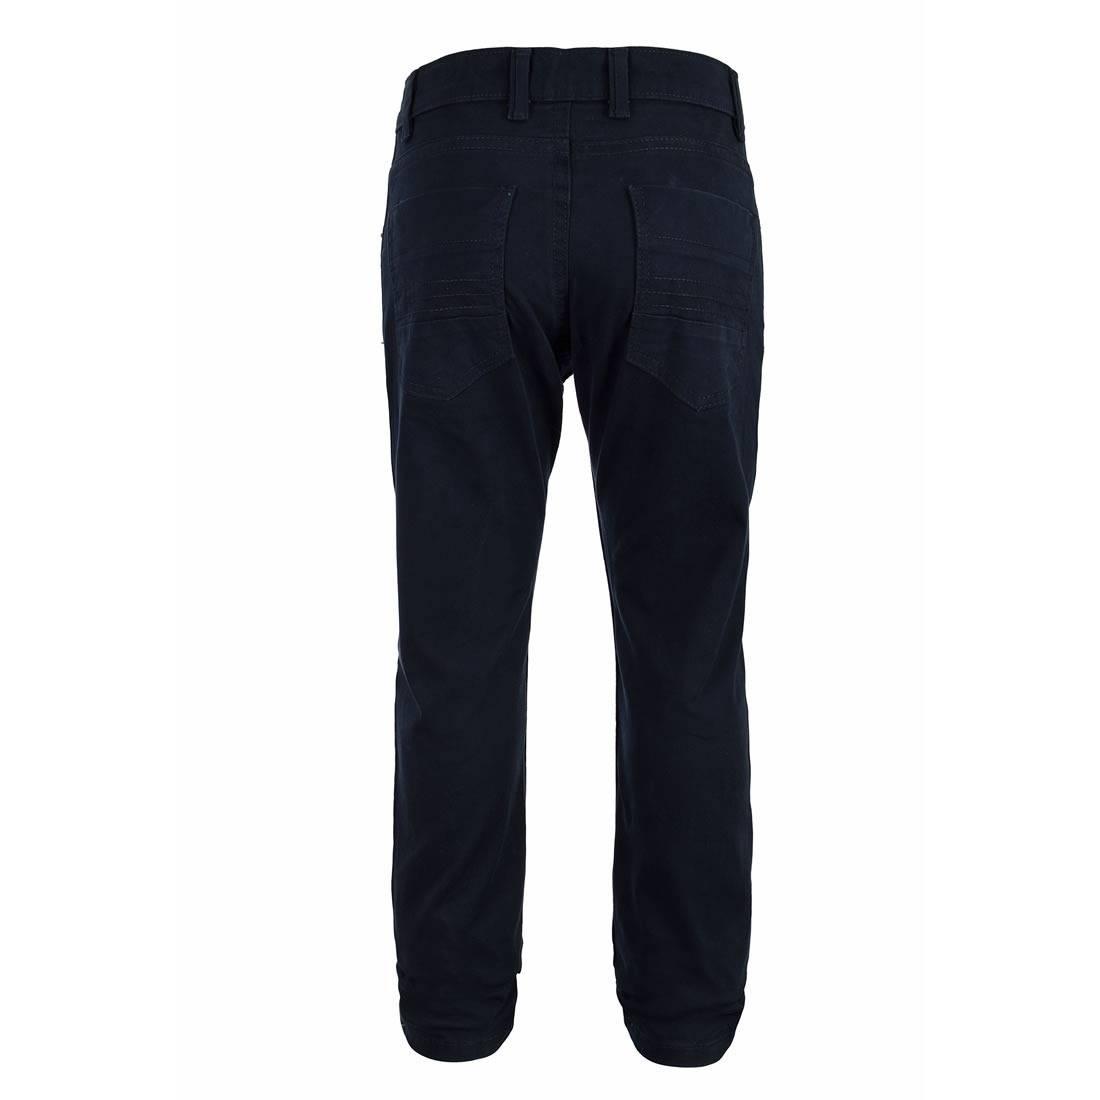 021109065419-02-Pantalon-Vaquero-Boys-Gabardina-Con-Elastano-Skinny-Fit-Cintura-Ajustable-Marino-yale